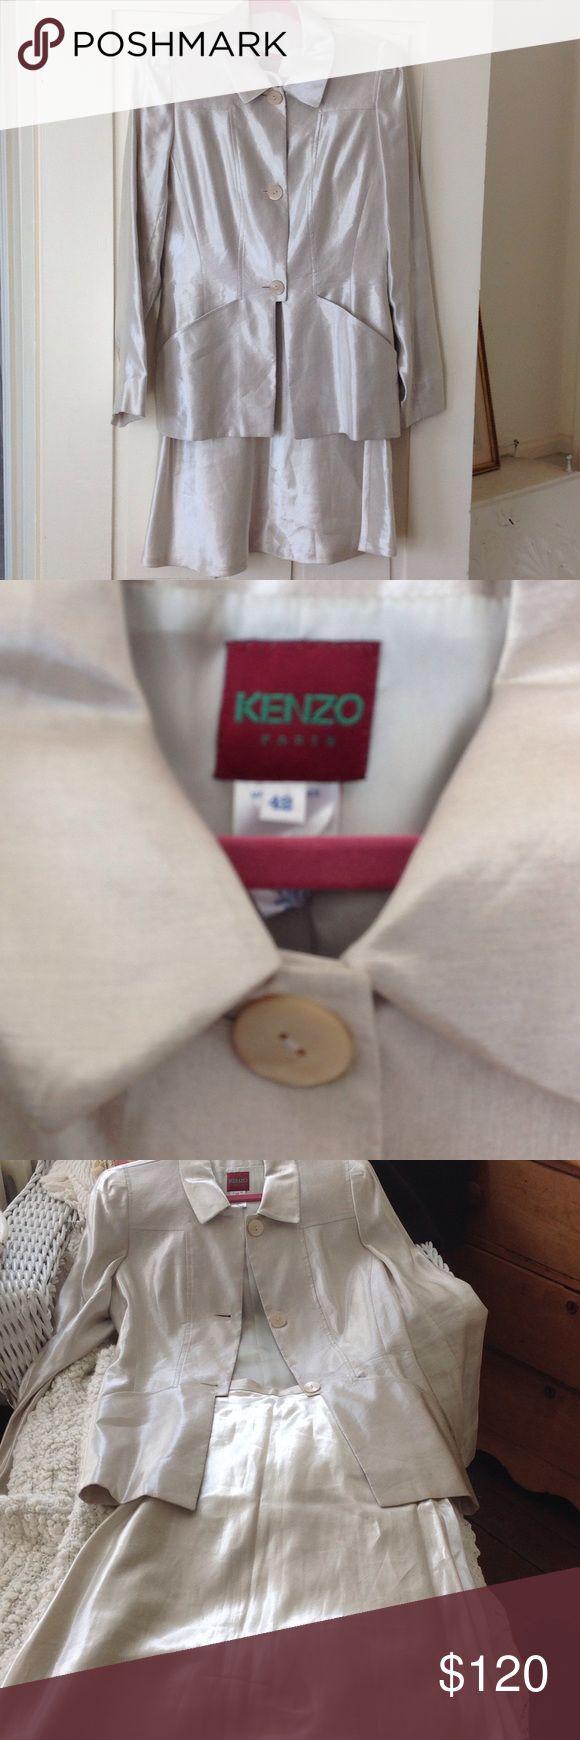 Kenzo linen acetate suit, Paris Designer suit linen acetate fabric, skirt is knee length. Almost new! Kenzo Dresses Long Sleeve